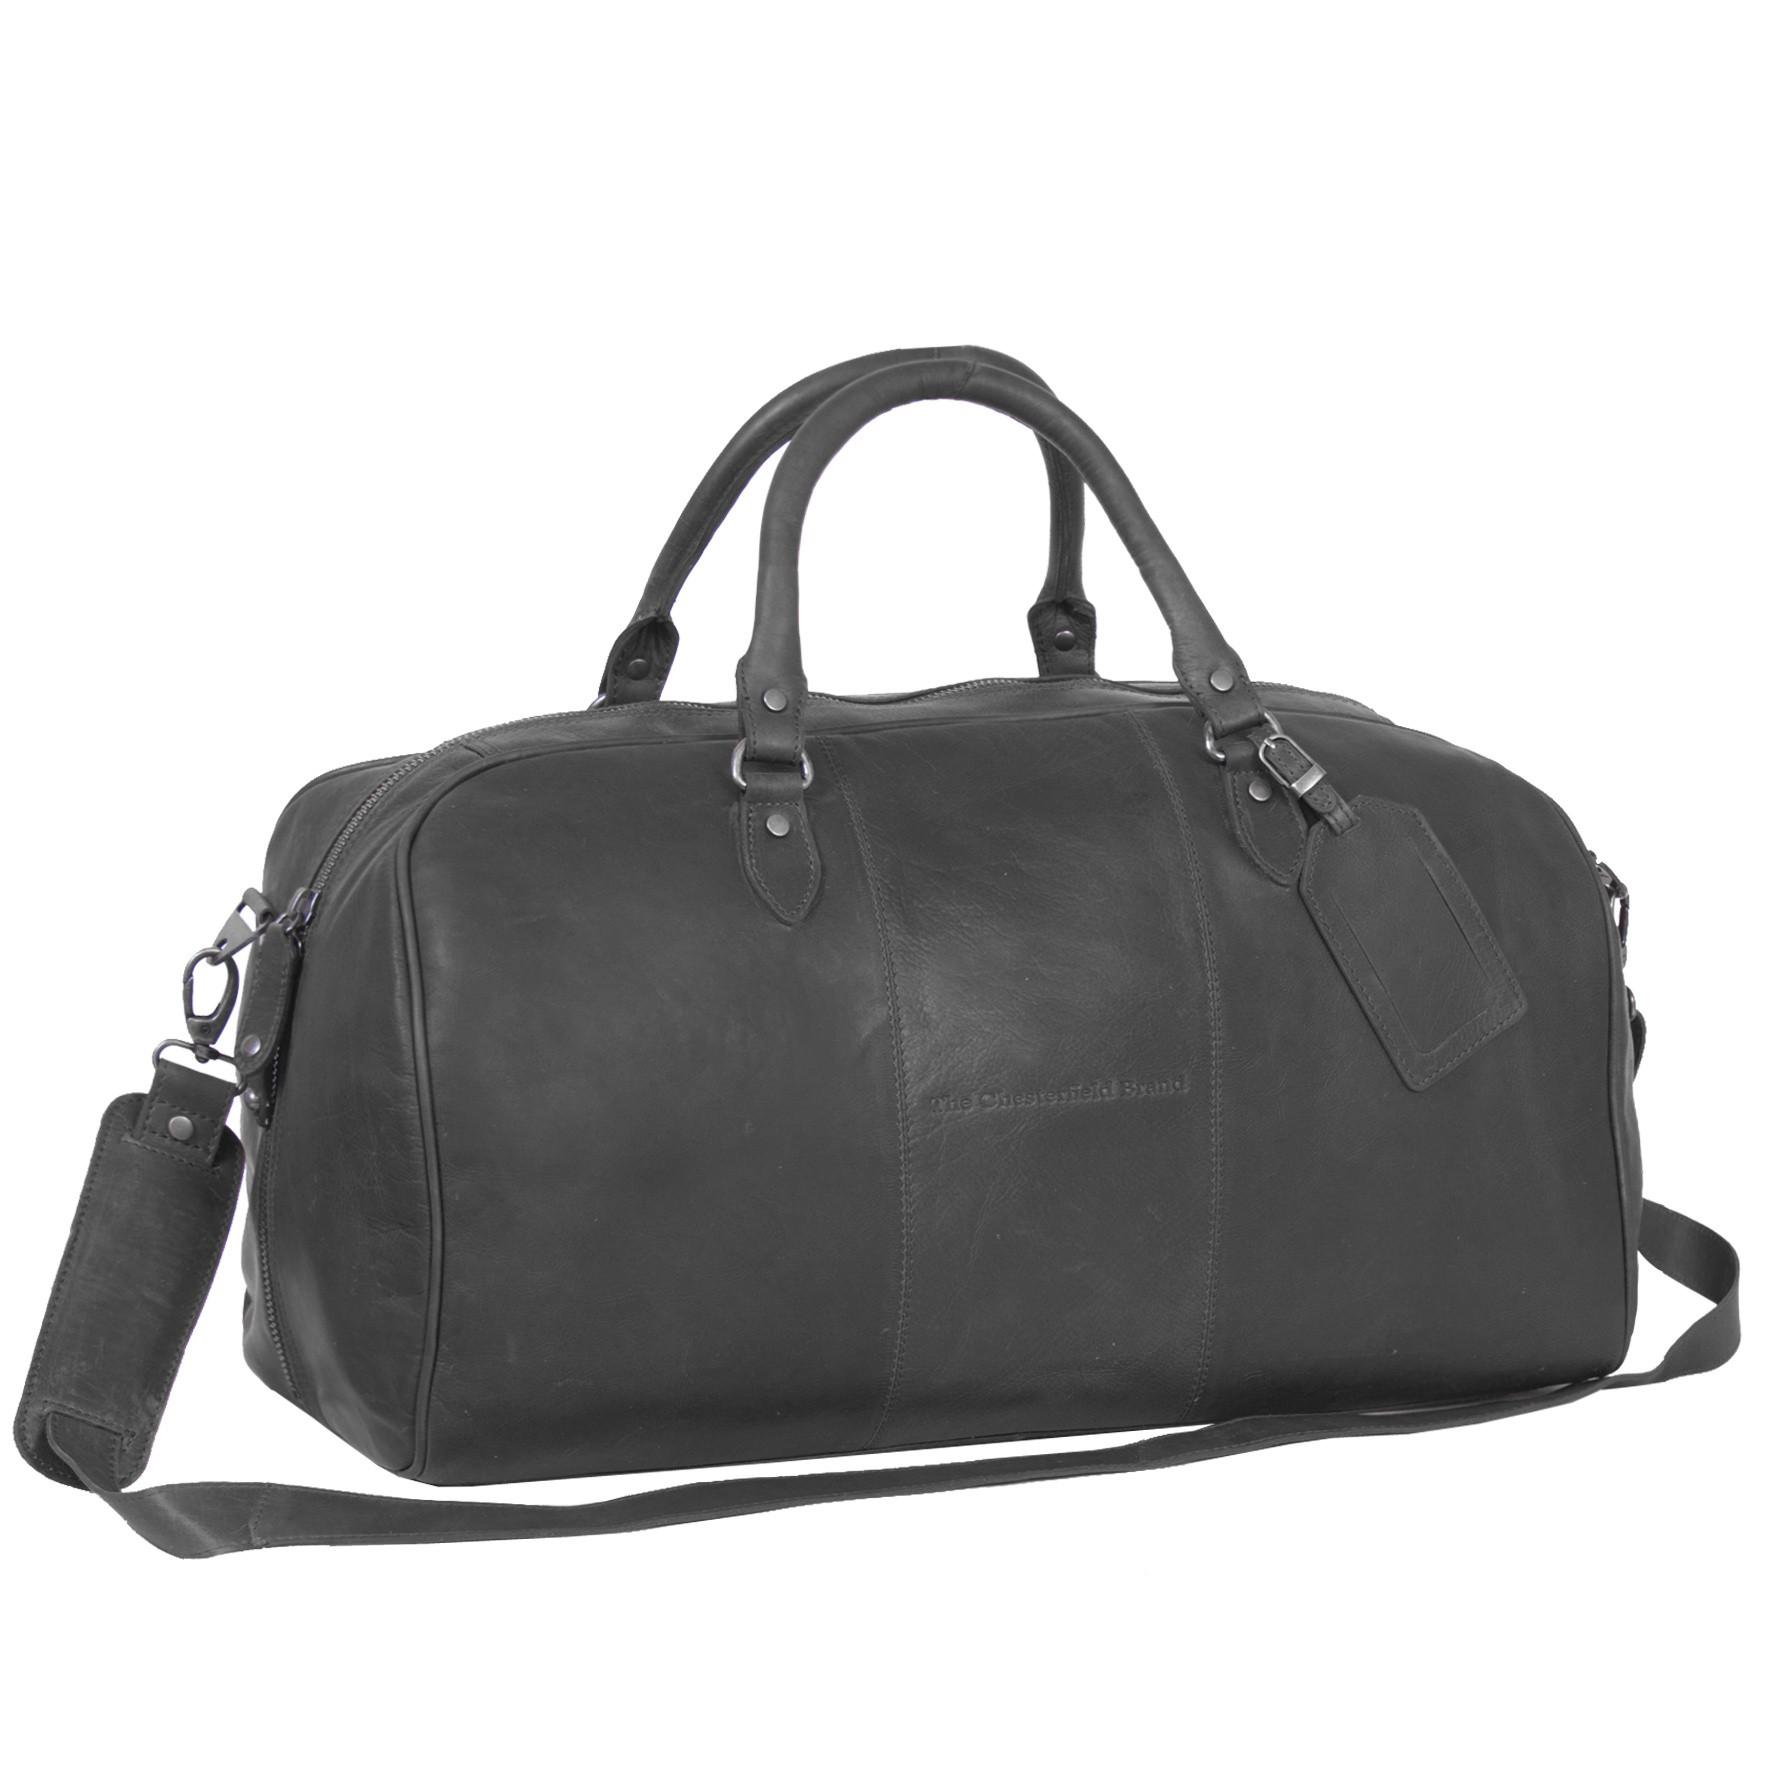 Chesterfield Travelbag 'William' C20.0004 Black